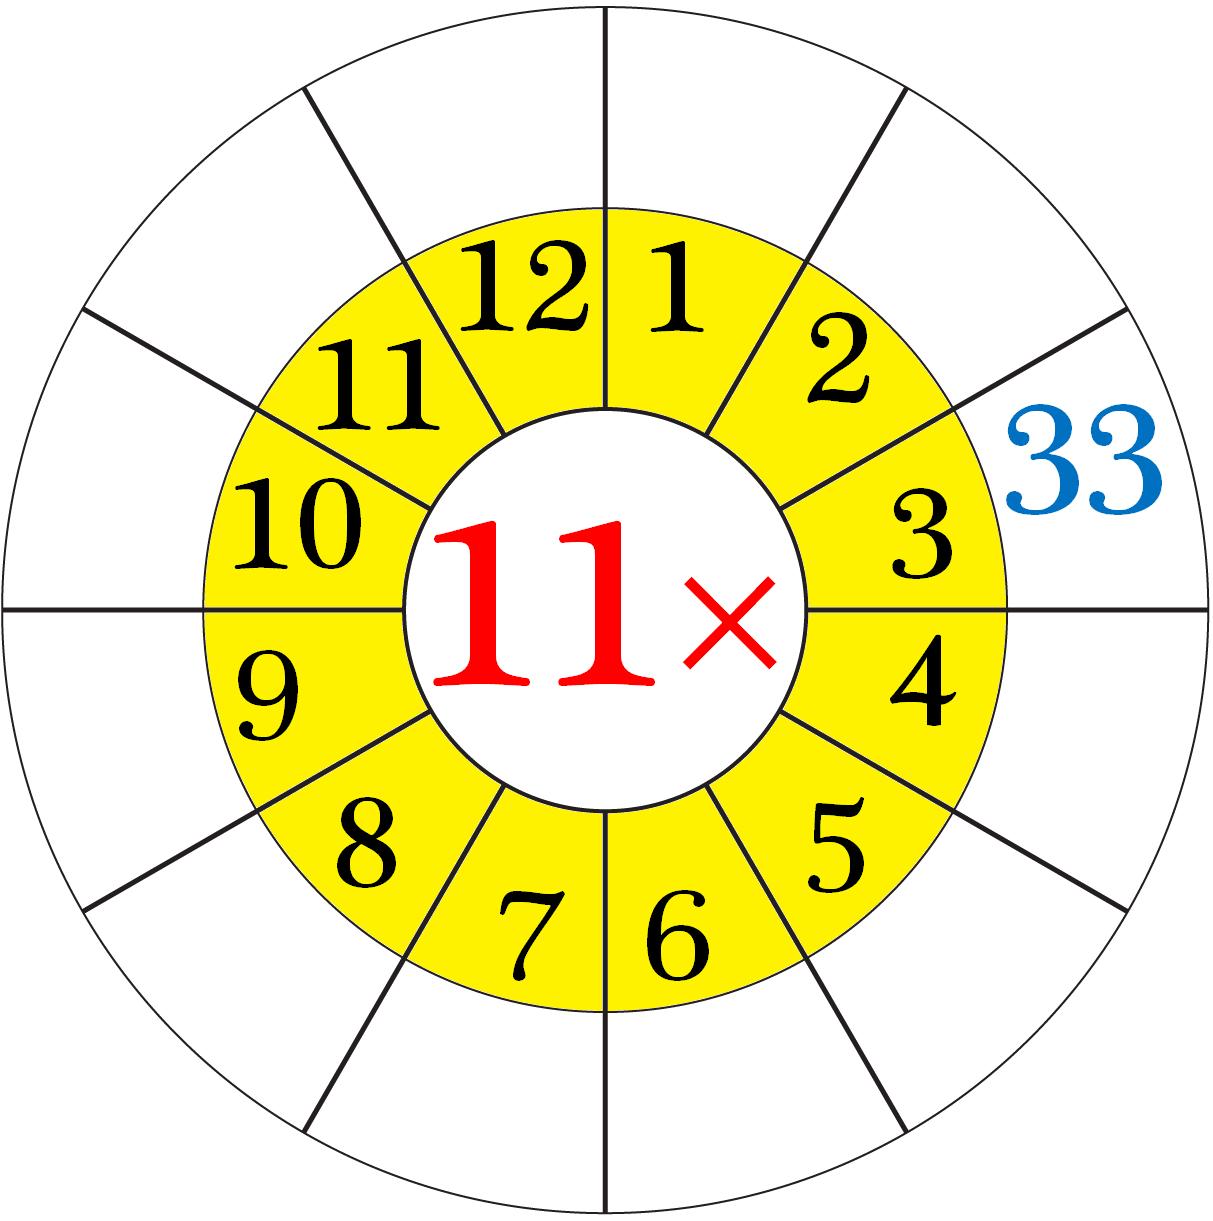 Worksheet on Multiplication Table of 11